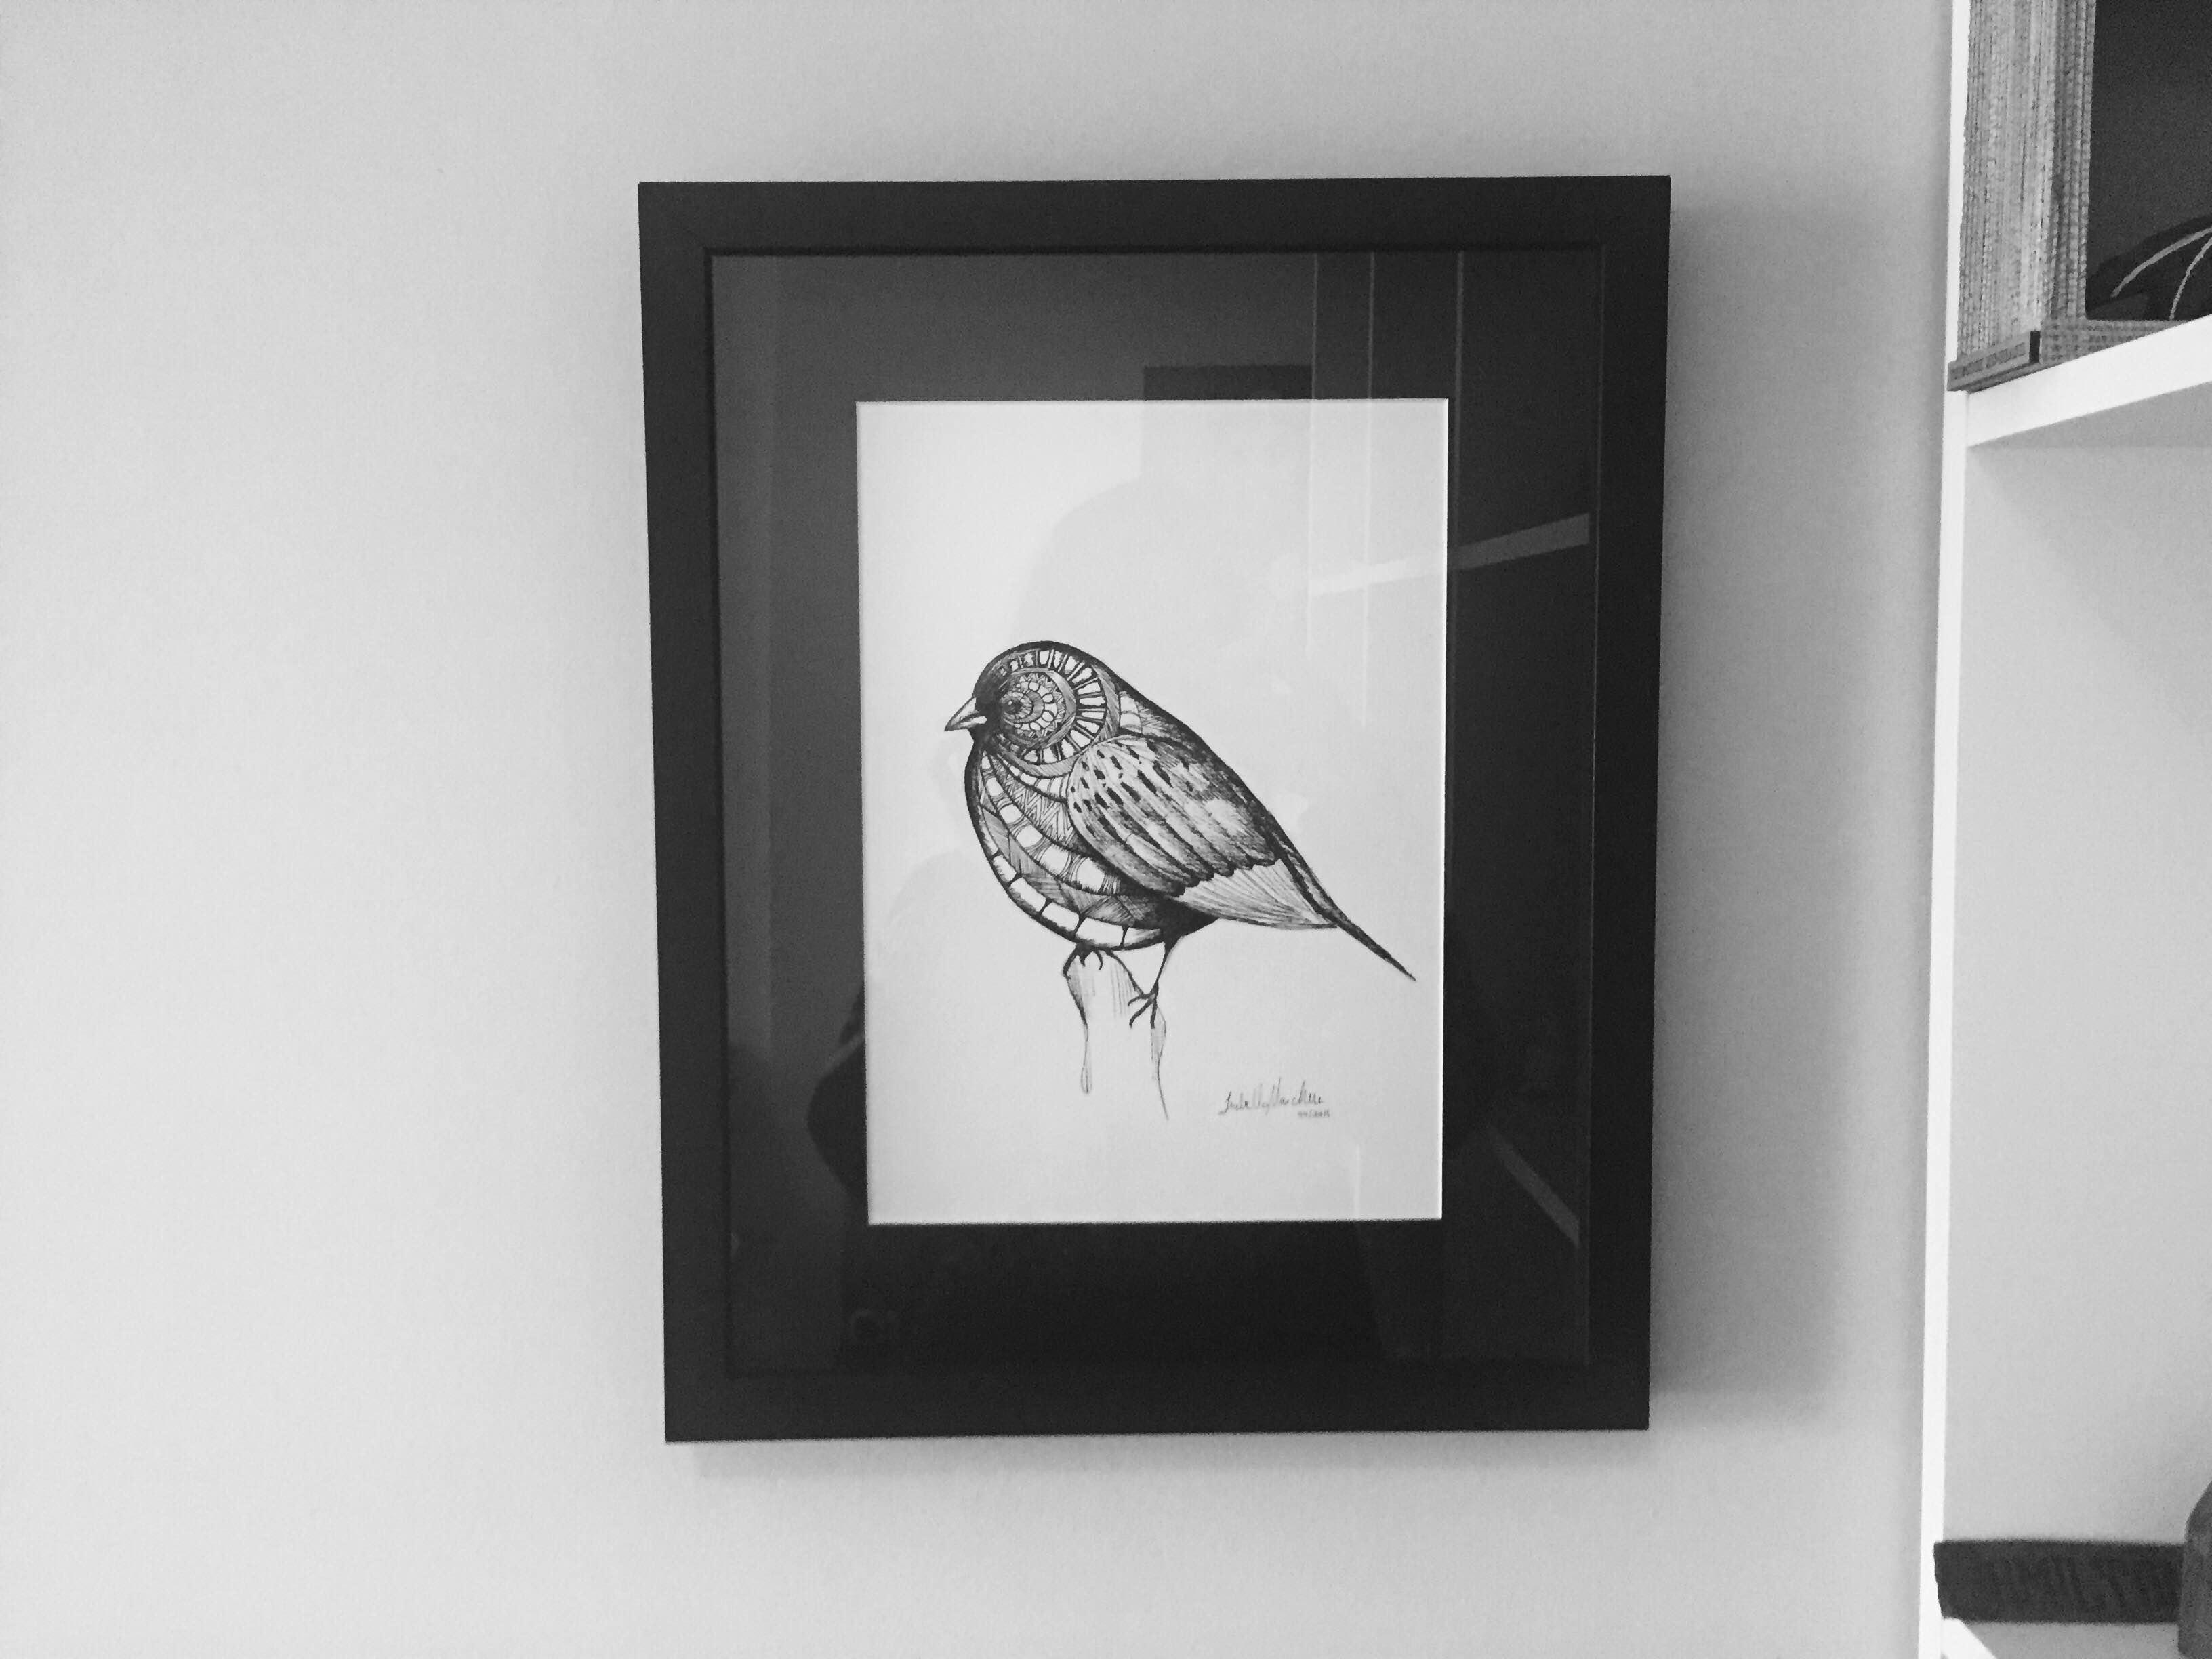 Pássaro 2-A4